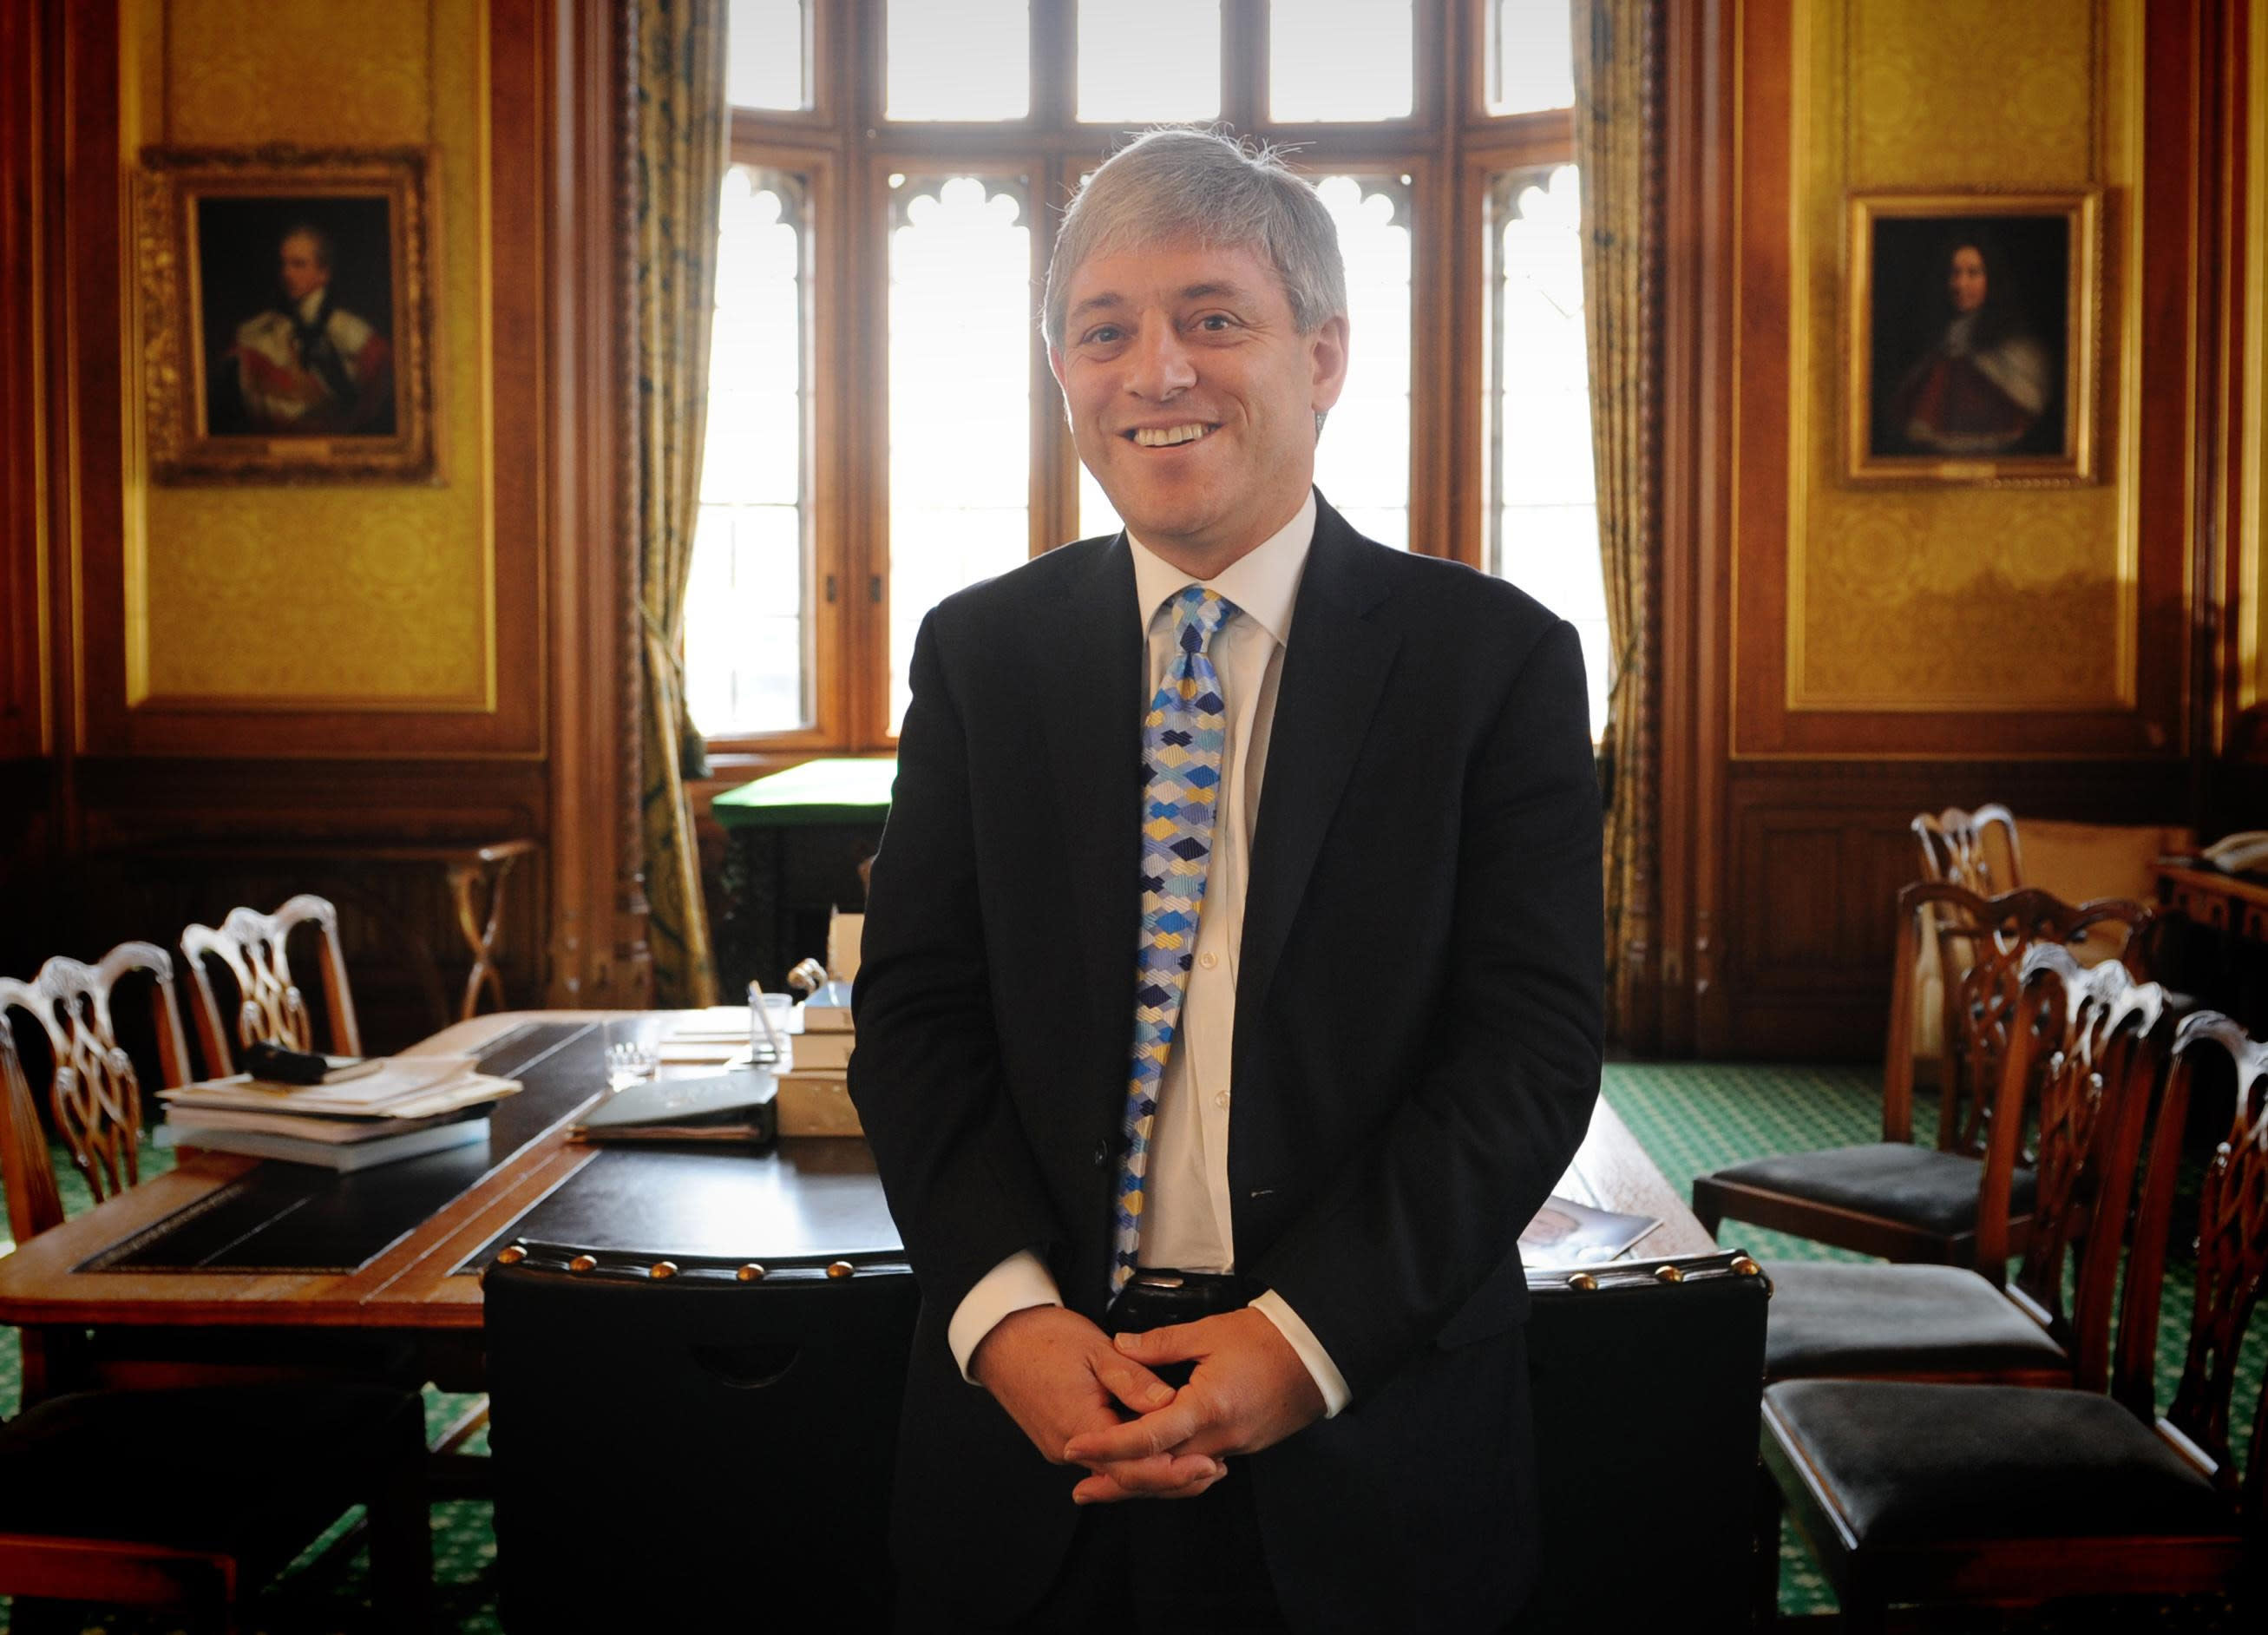 U.K. Parliament speaker to step down